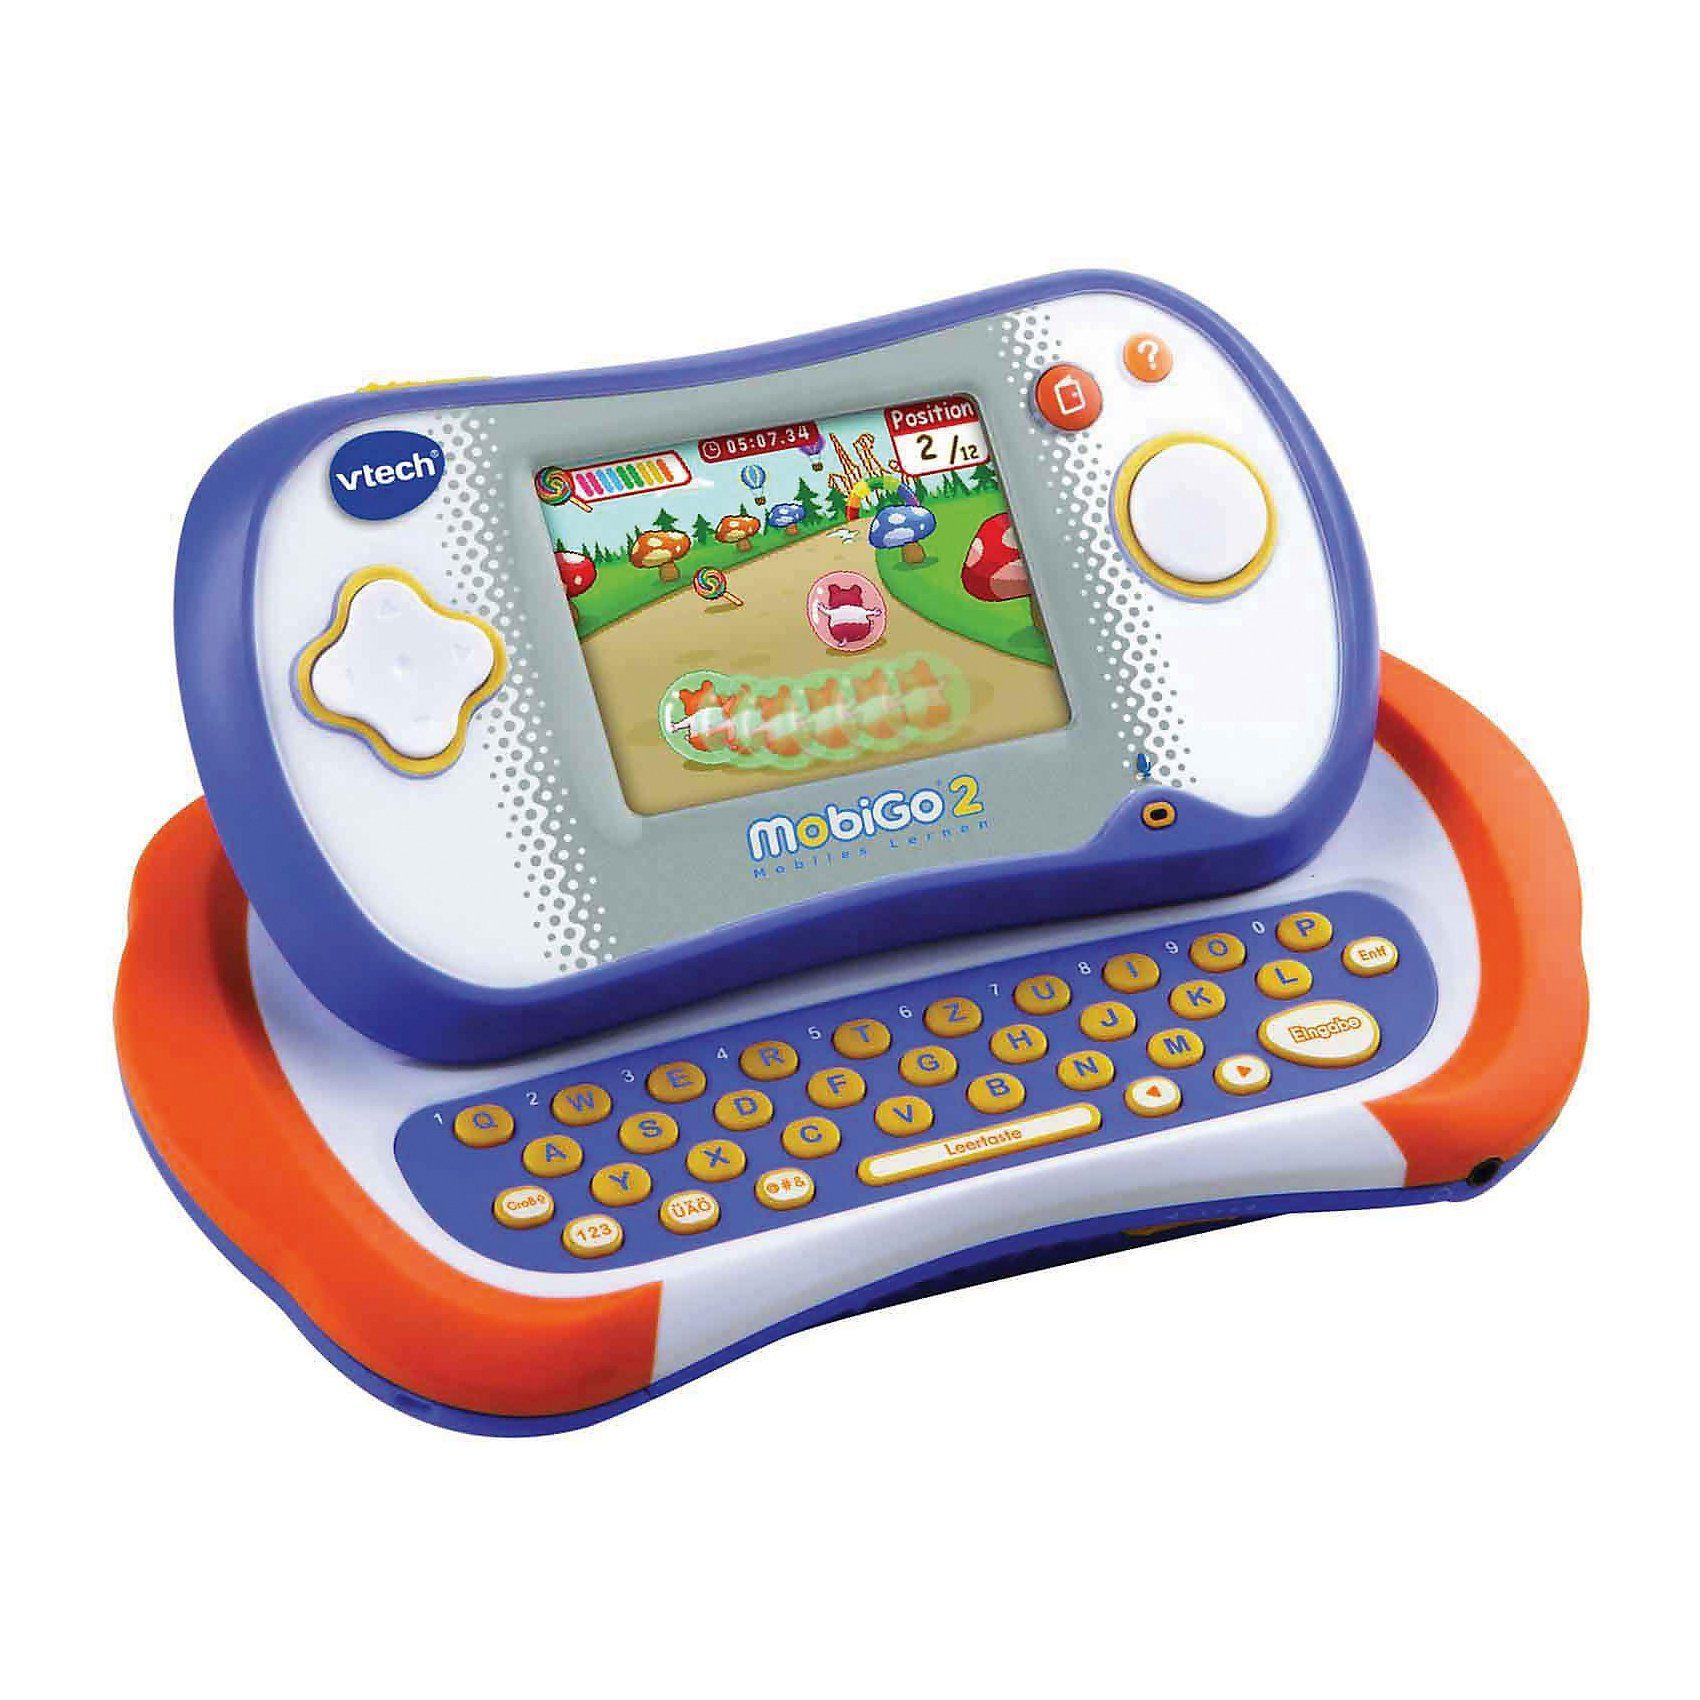 Vtech MobiGo 2 Lernkonsole inkl. Spiel, blau-orange